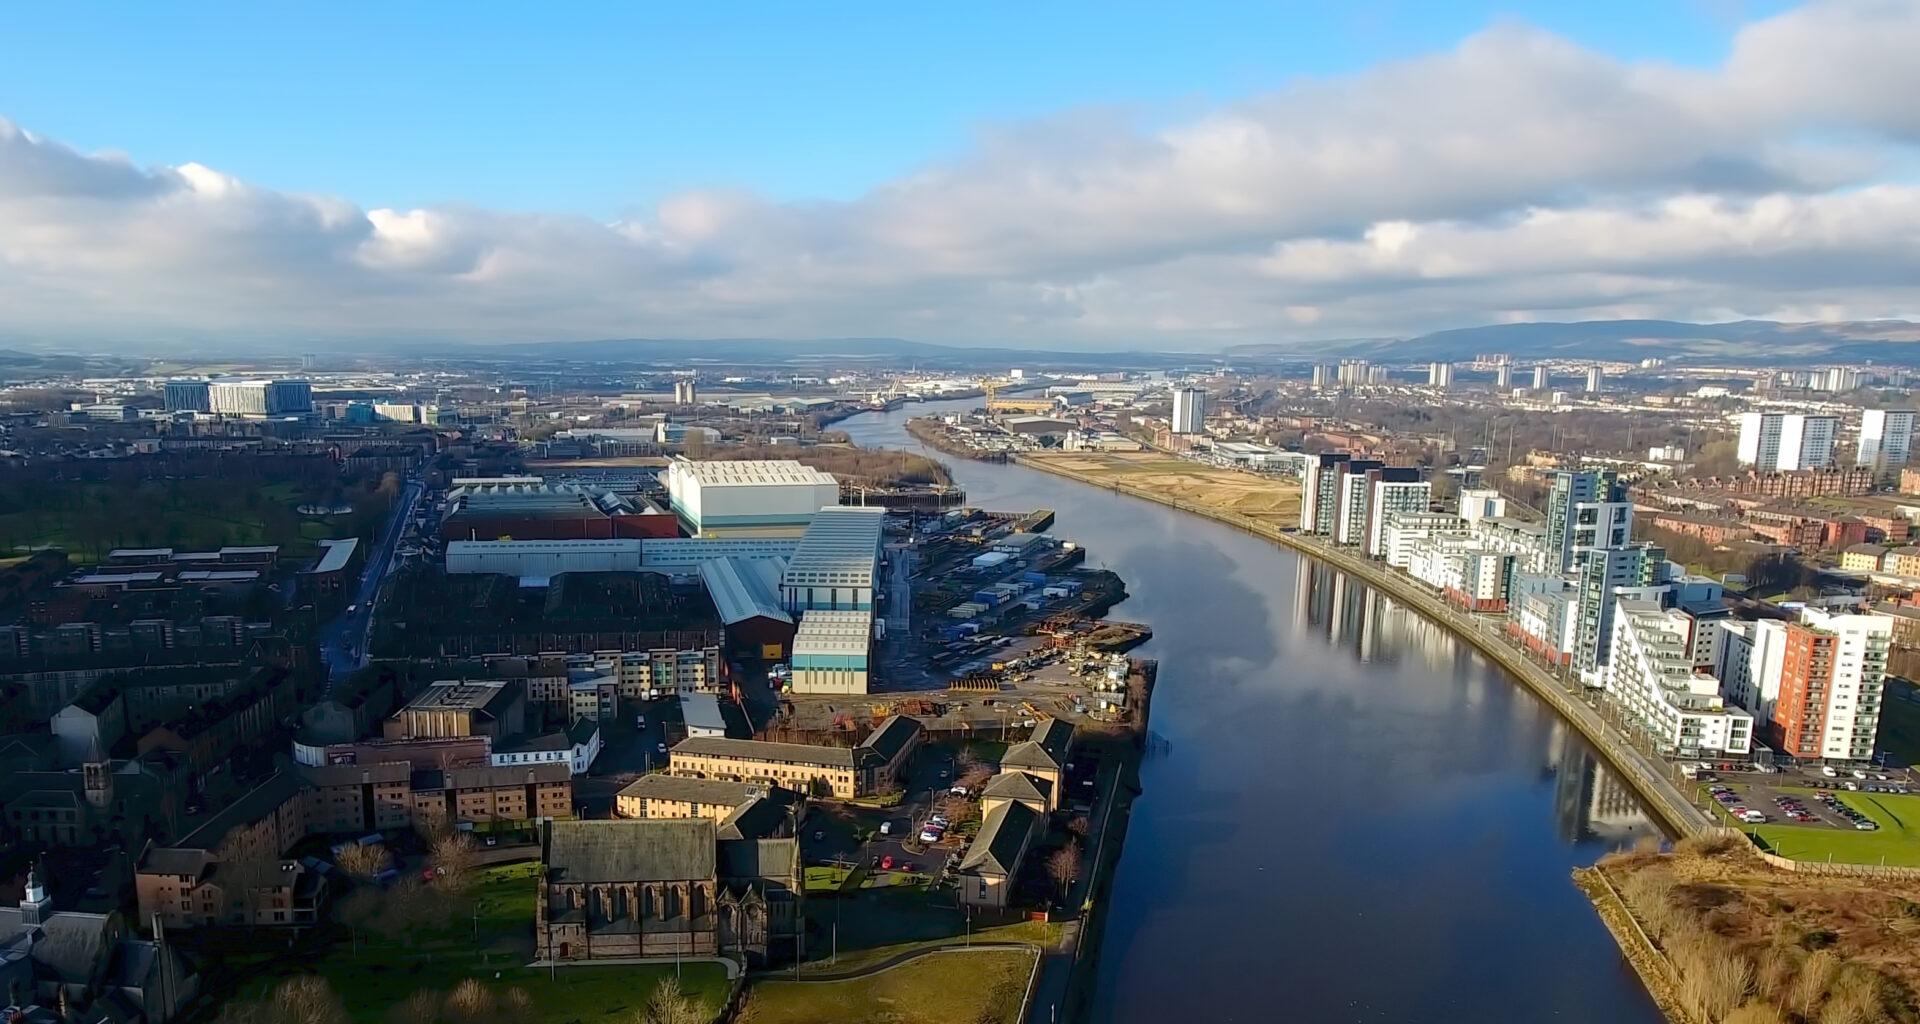 COP26: Shining a light on Glasgow